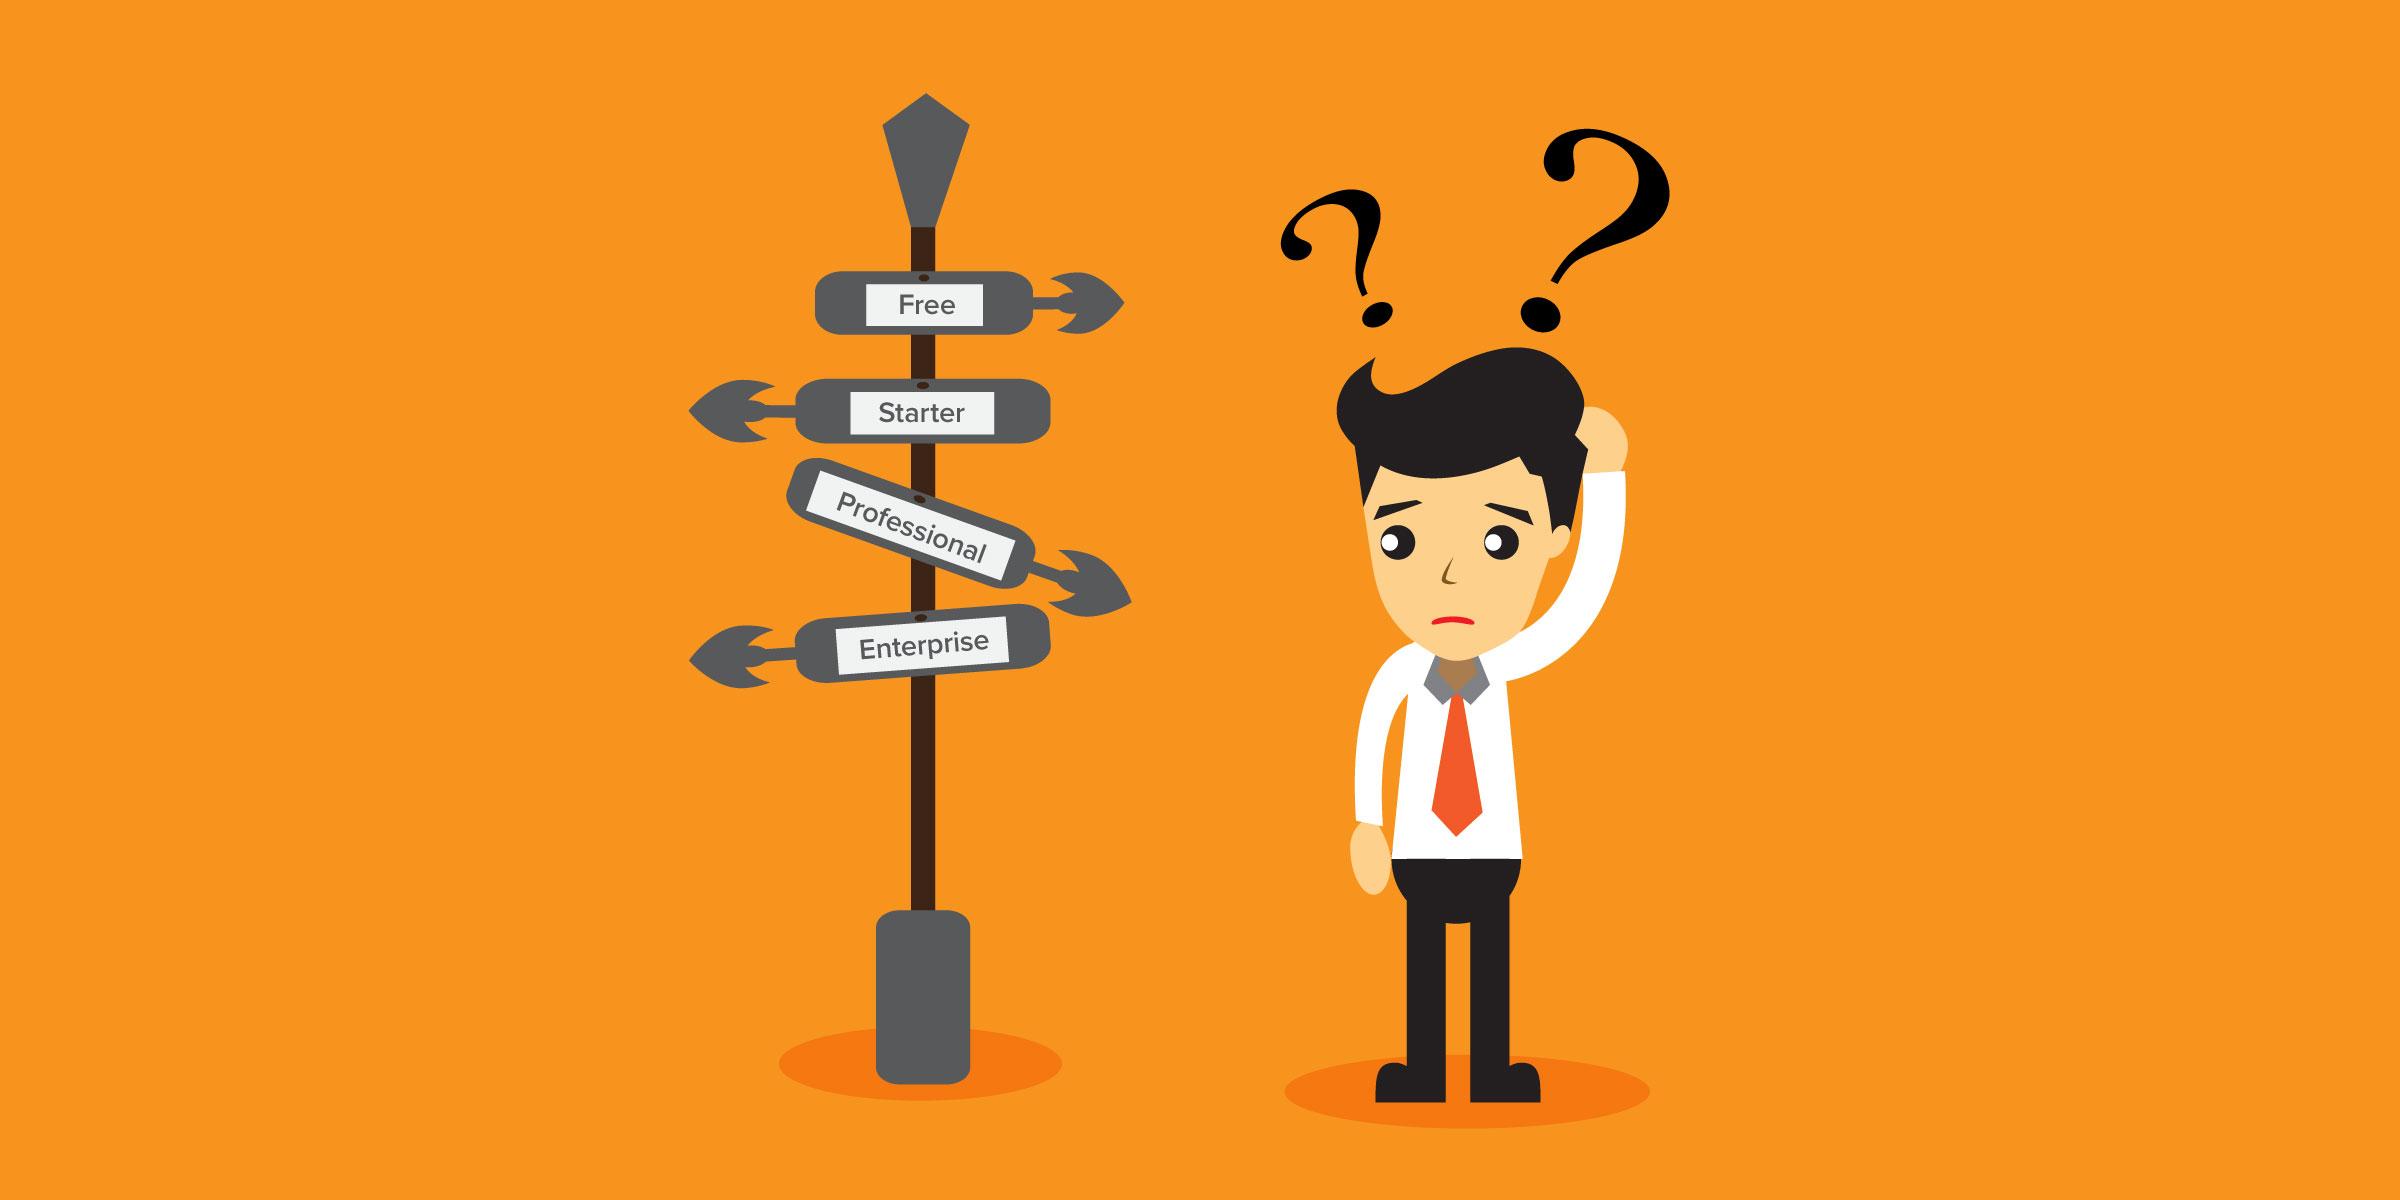 Which HubSpot Marketing Hub plan is right for you? Free vs. Starter vs. Pro vs. Enterprise